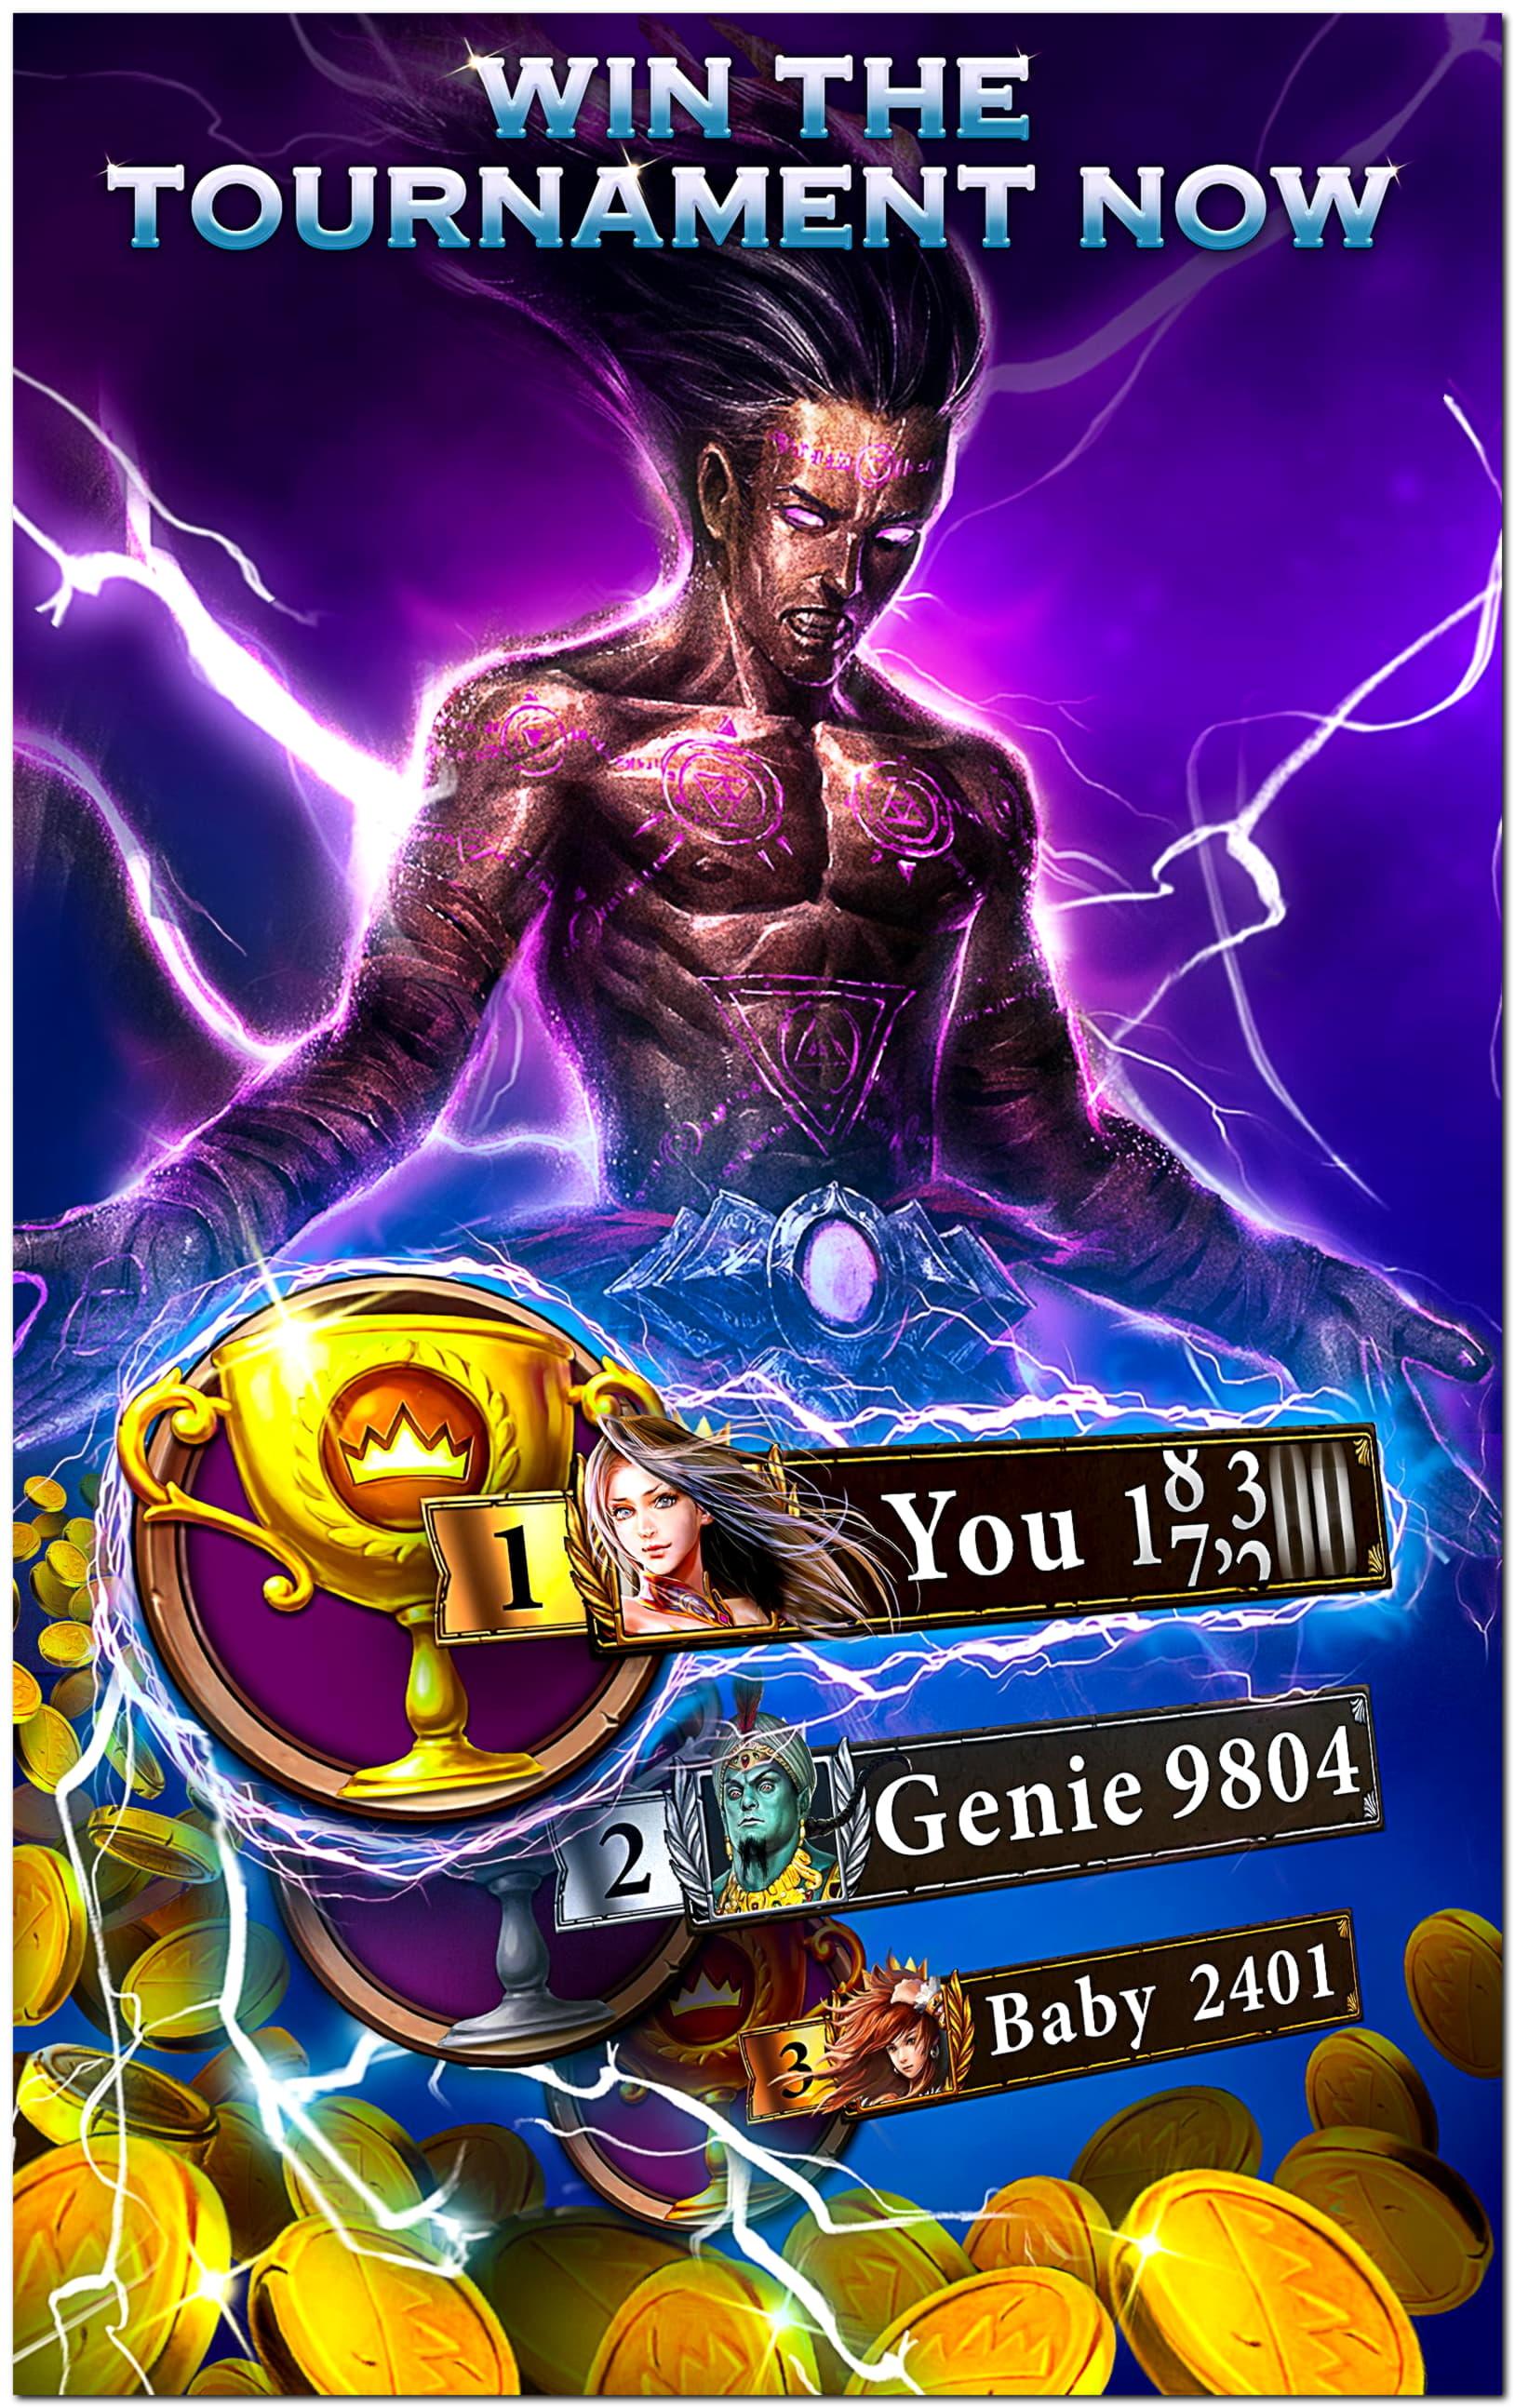 745% Best signup bonus casino at Gate777 Casino